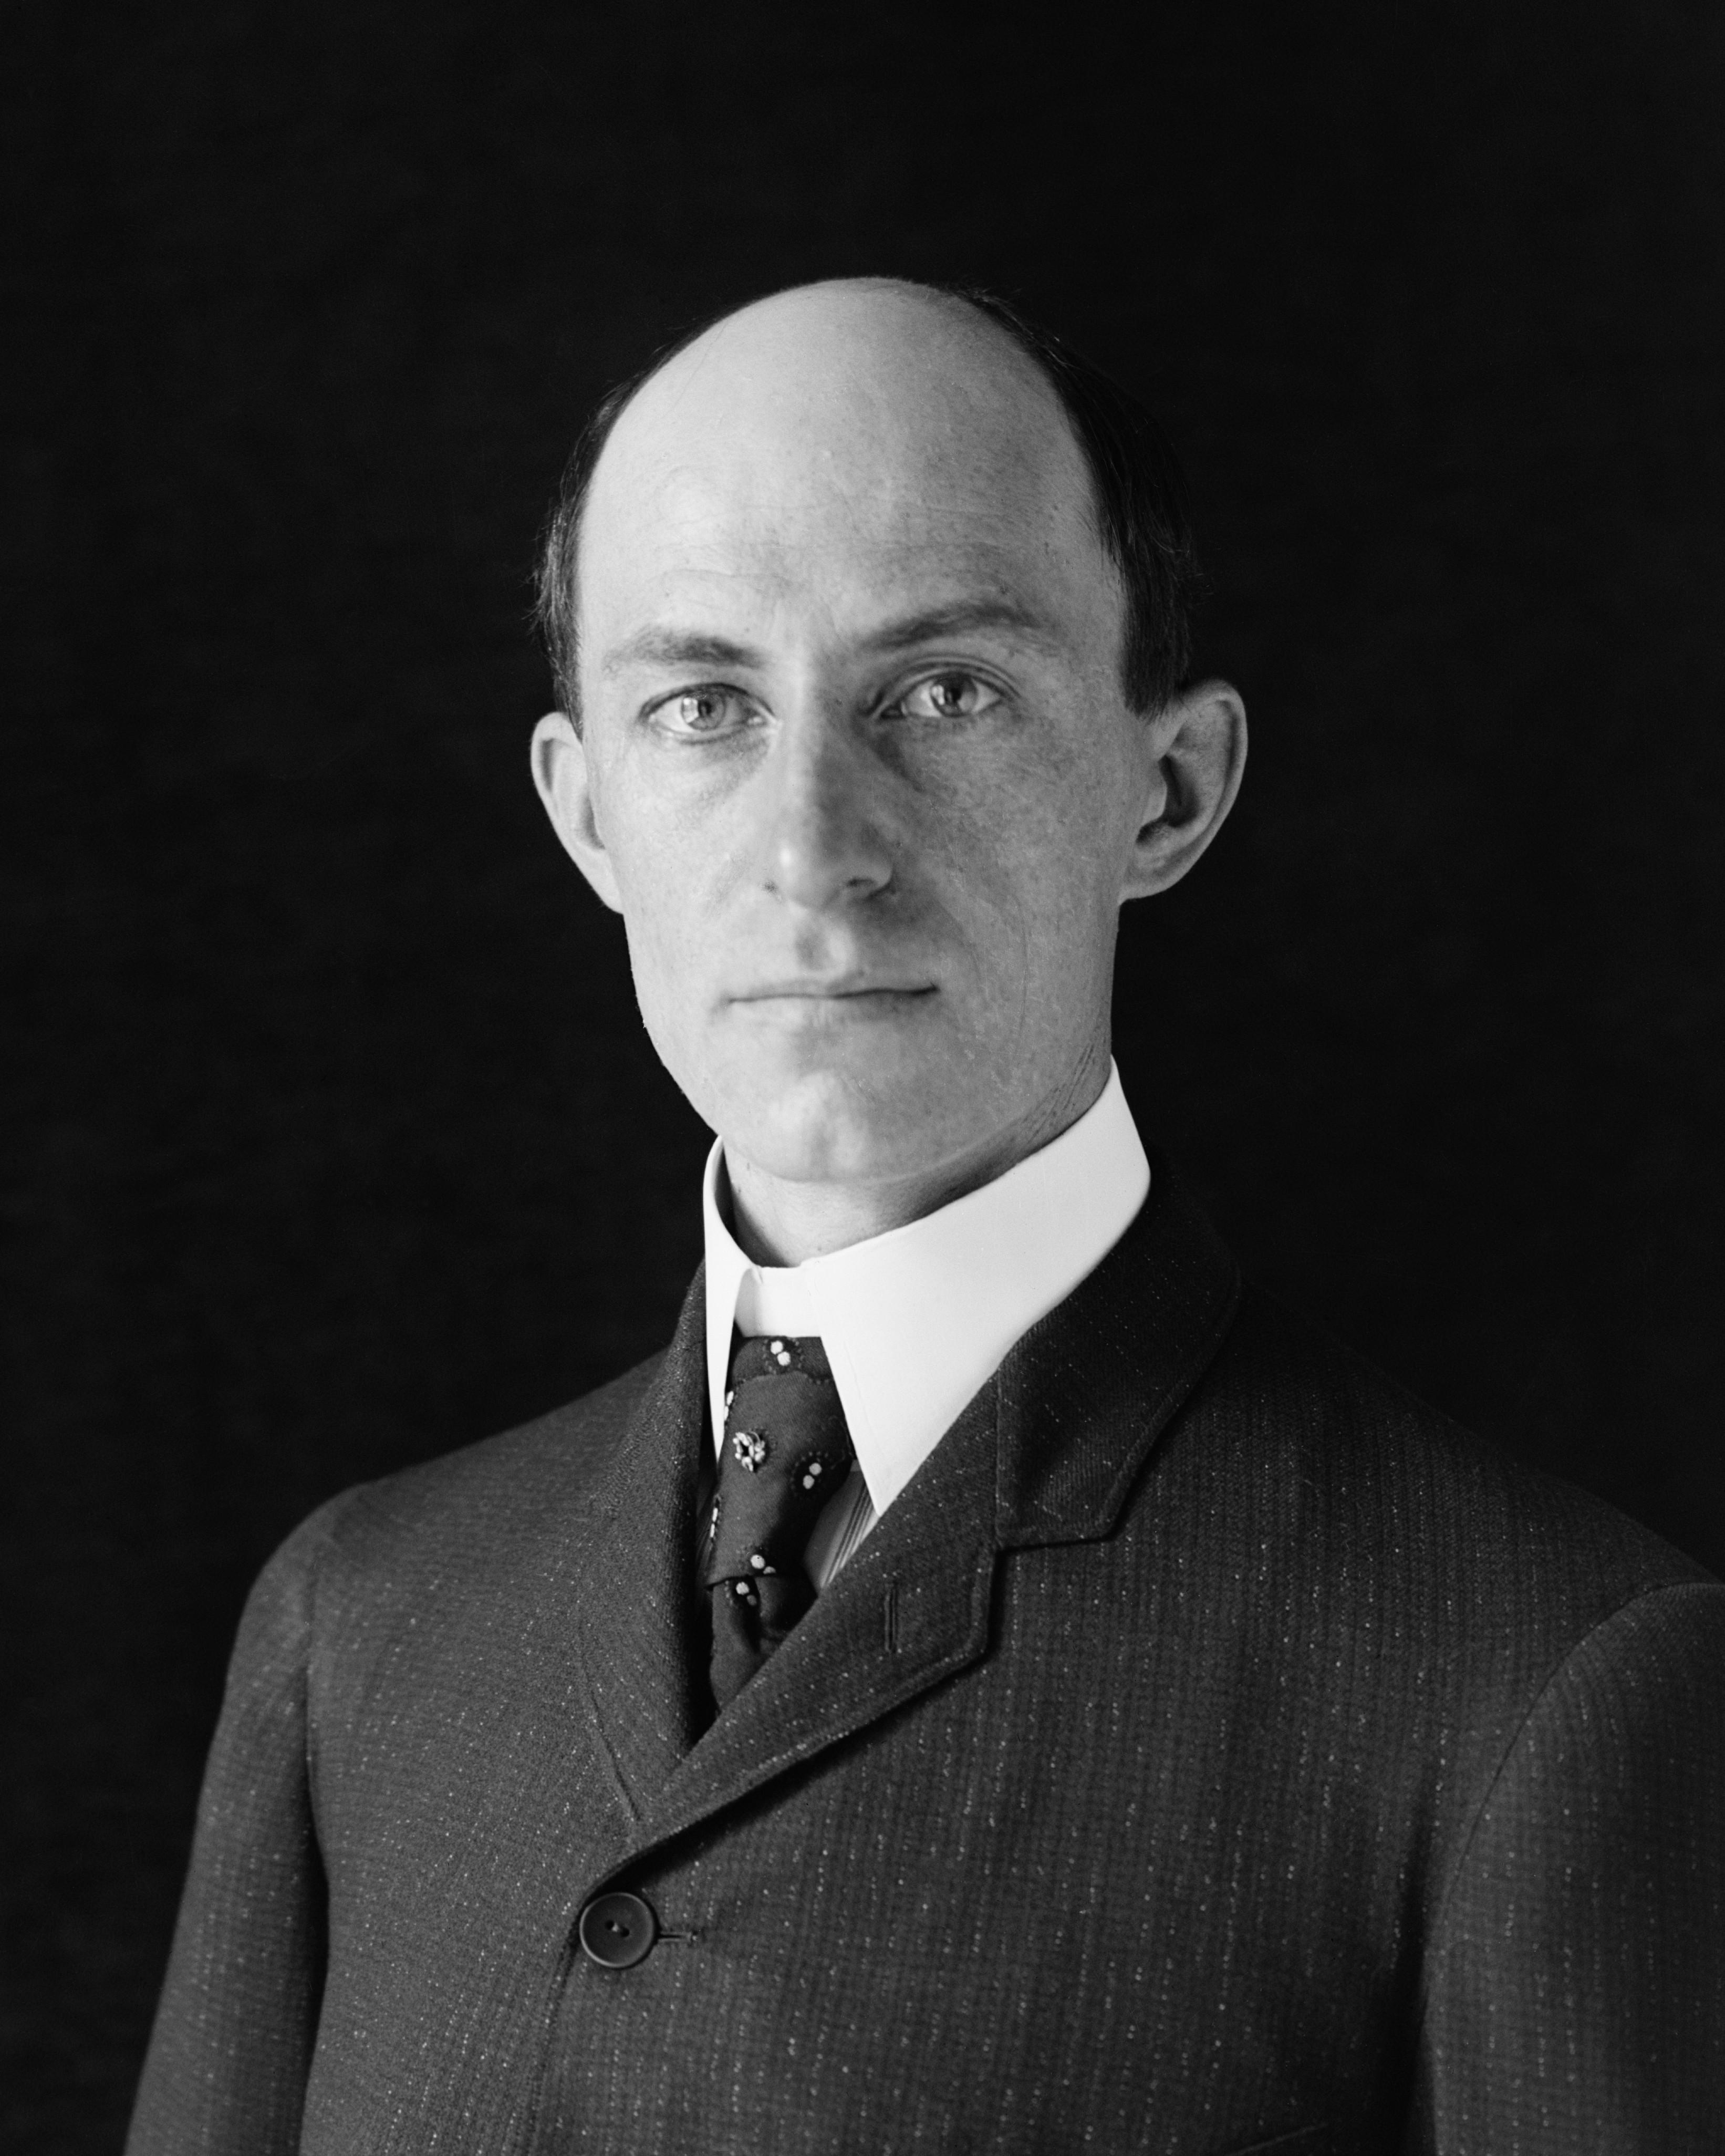 WILBUR WRIGHT (1867-1912)